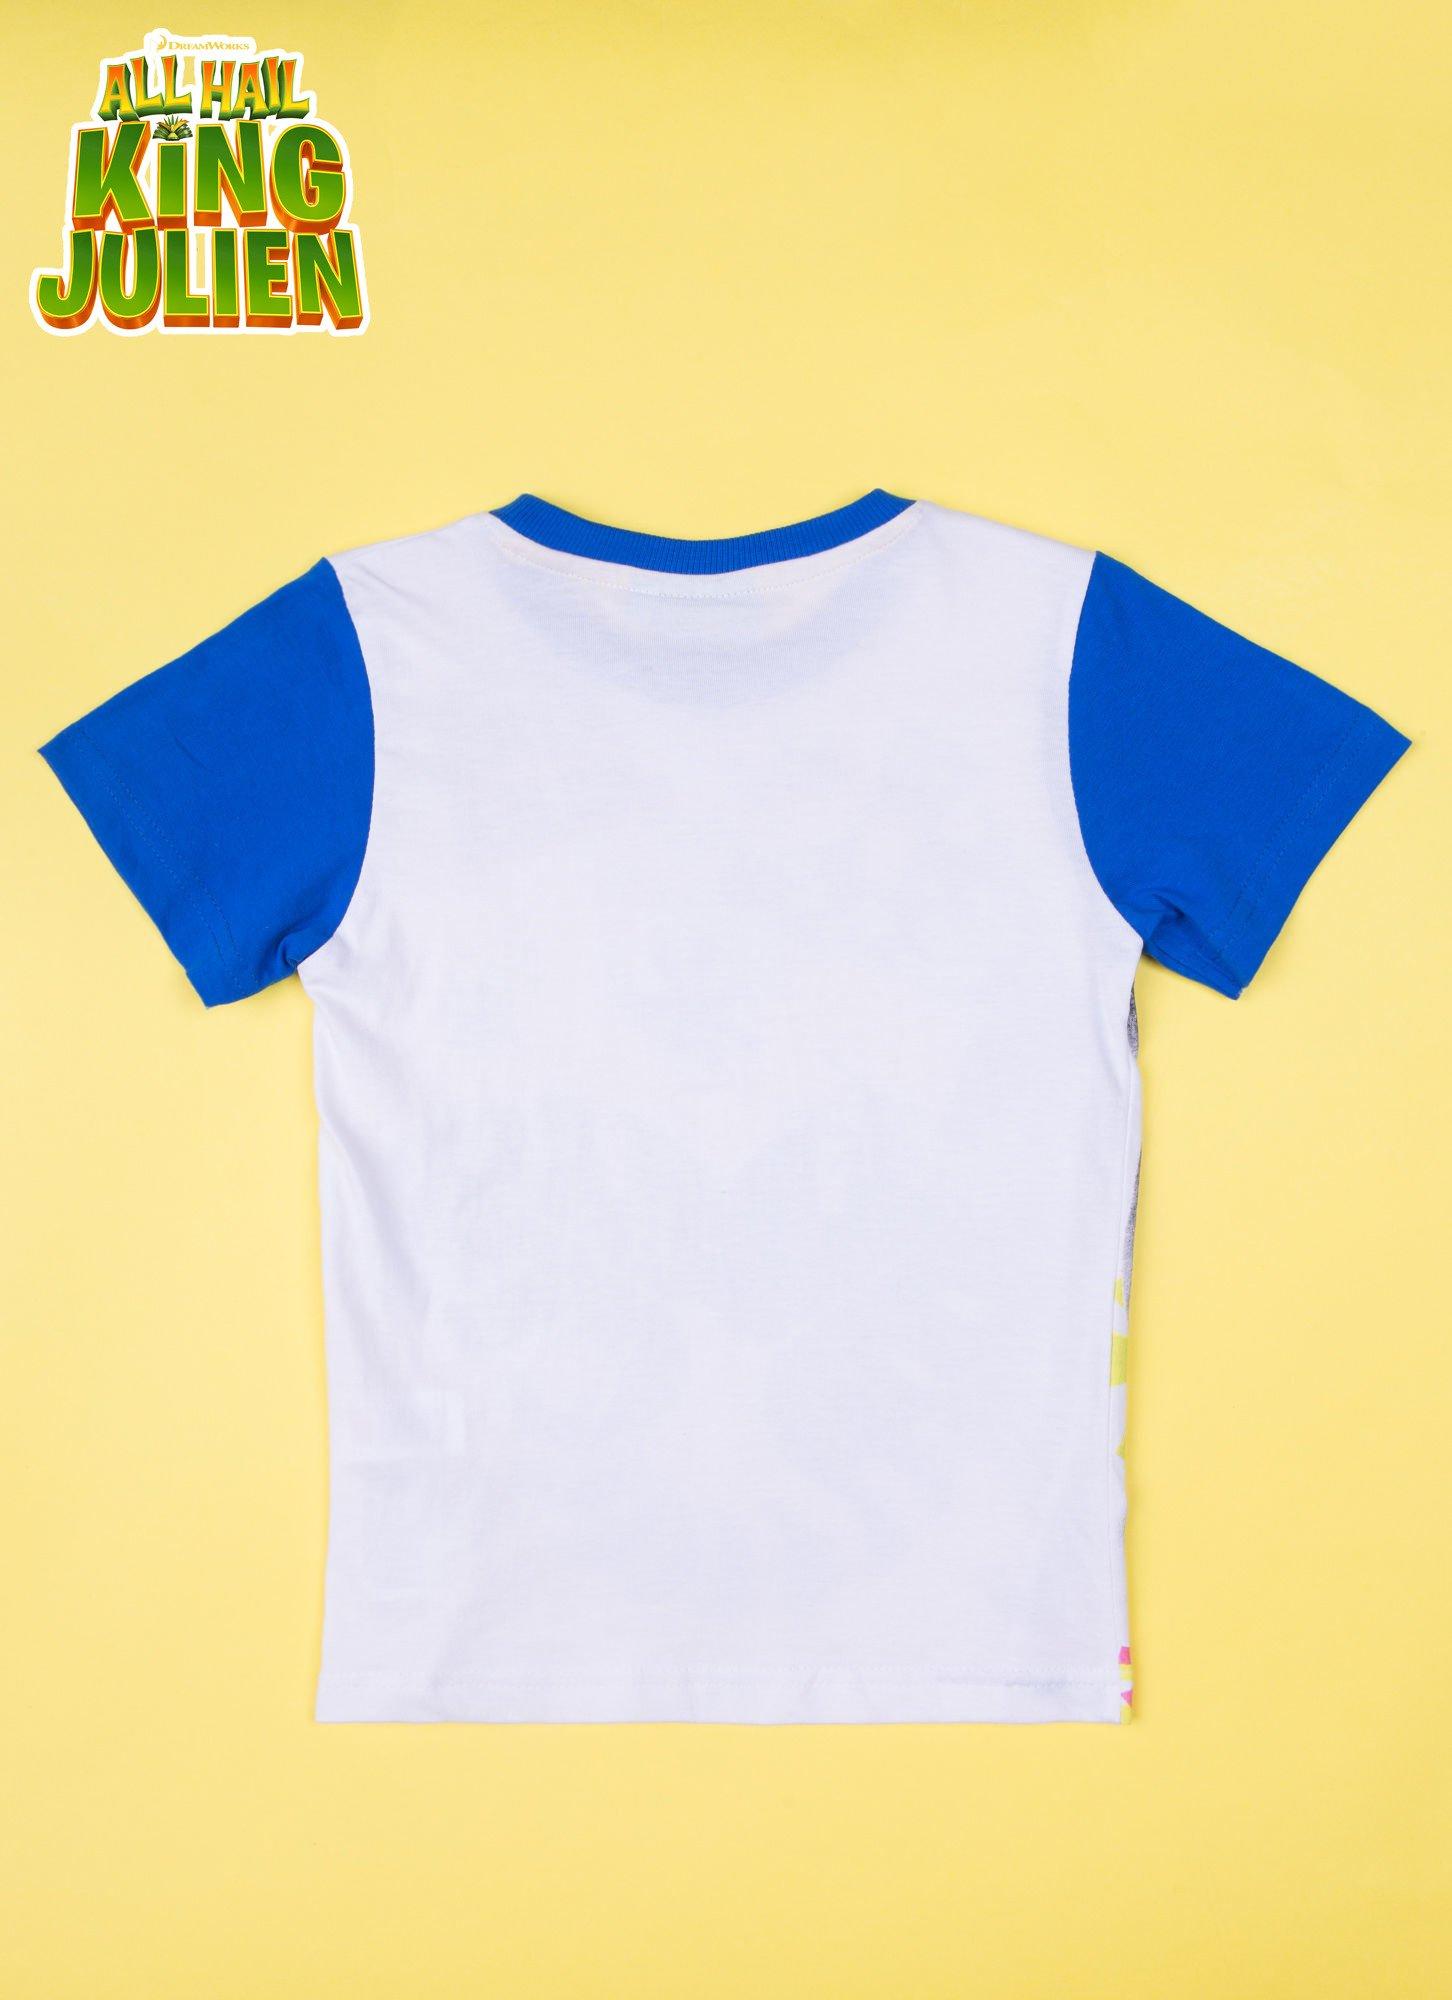 Niebieska piżama chłopięca KRÓL JULIAN                                  zdj.                                  3